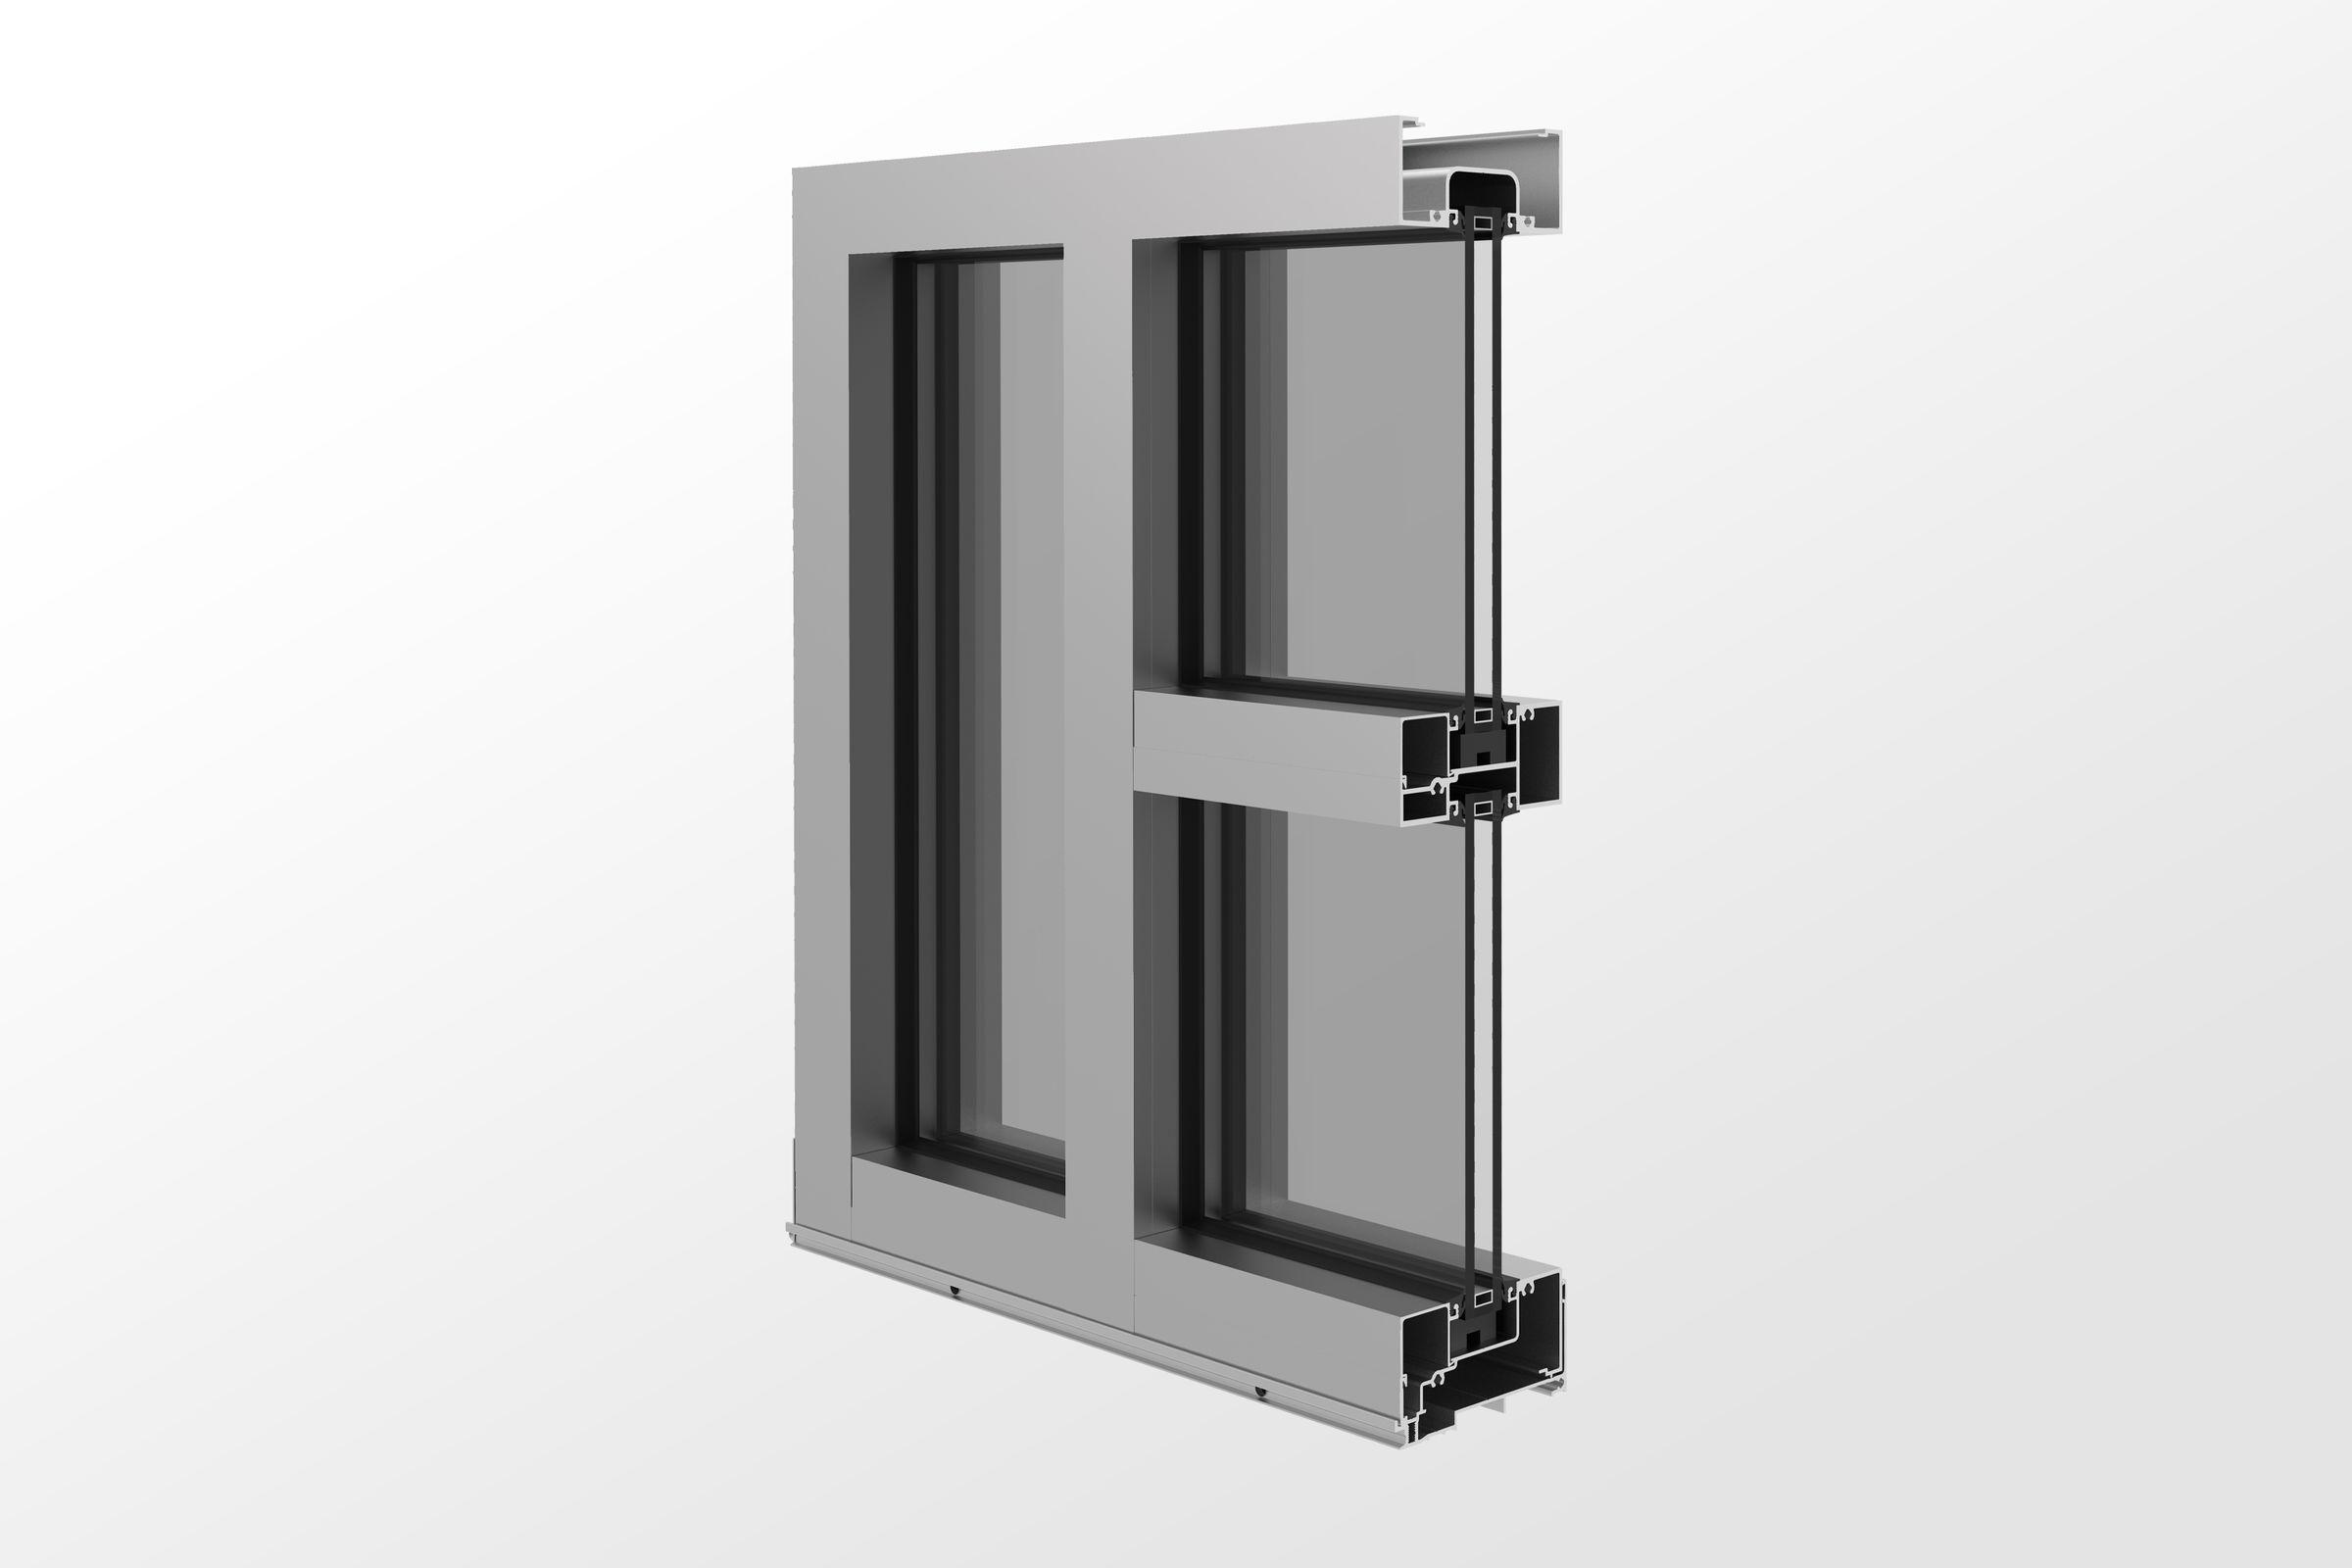 YES FI Center Set Flushed Glazed Storefront System